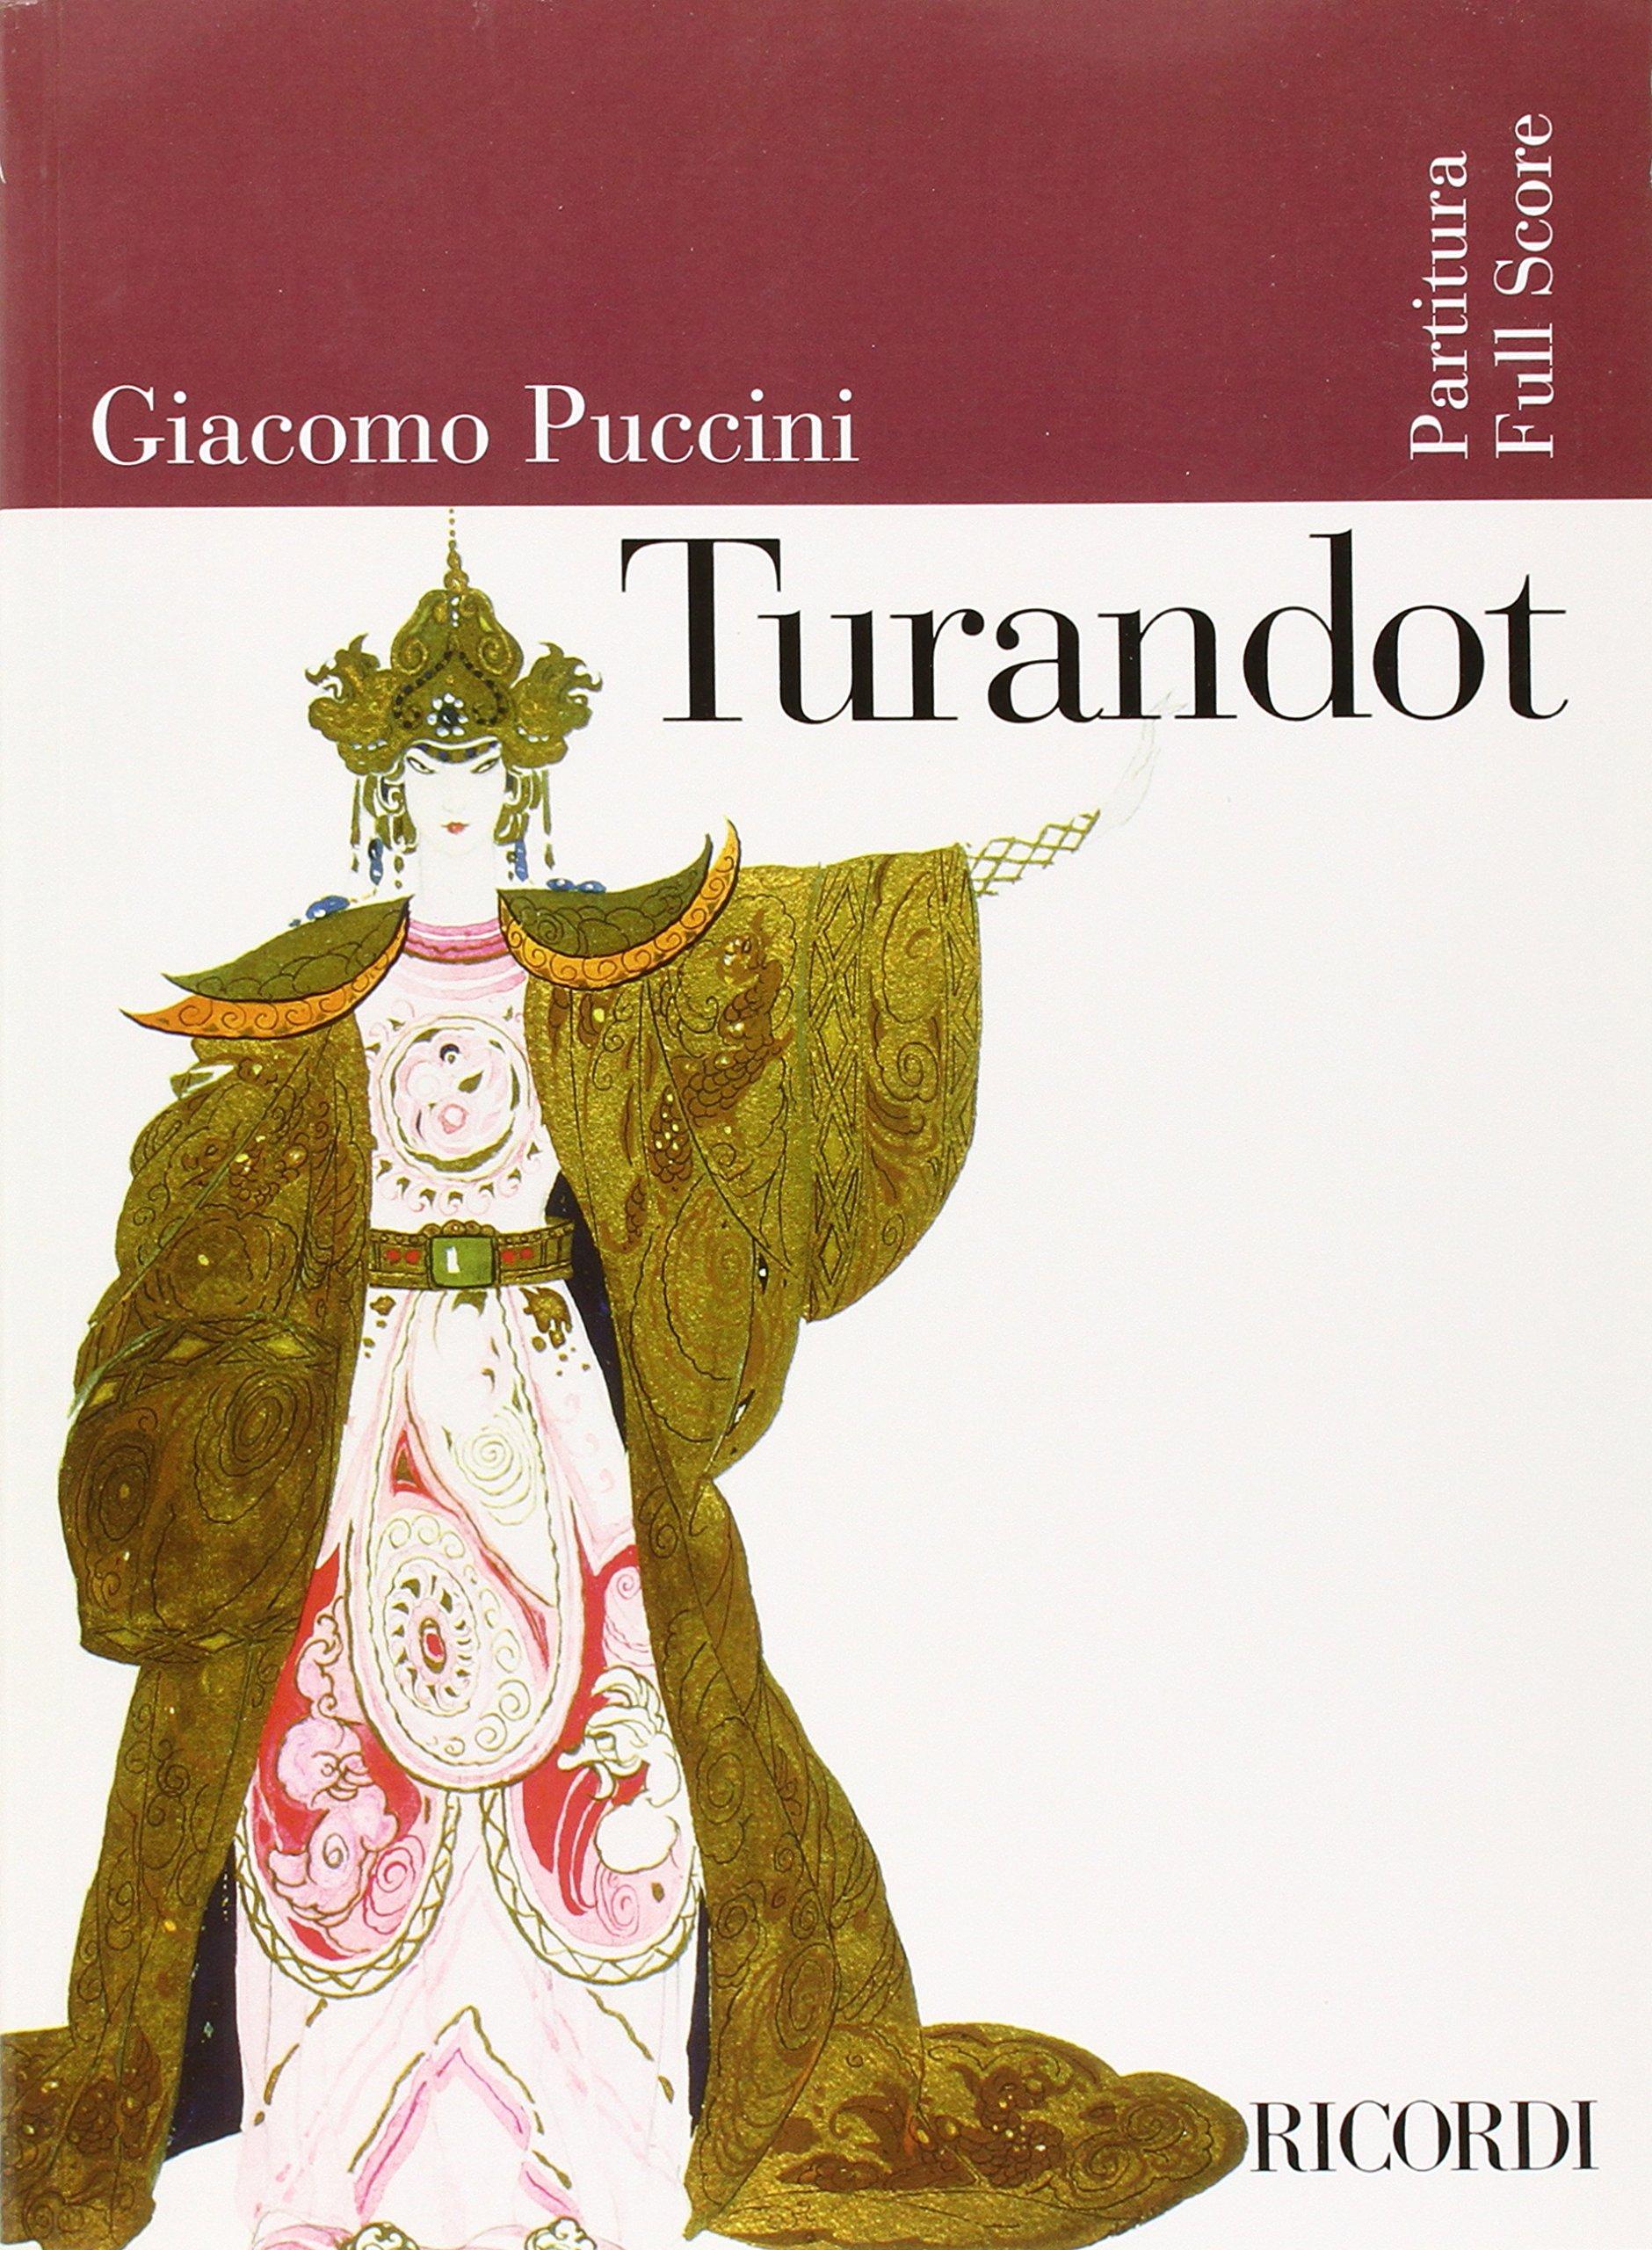 Turandot: Full Score (Ricordi Opera Full Scores): Amazon.co.uk: Giacomo  Puccini: 9780634023859: Books